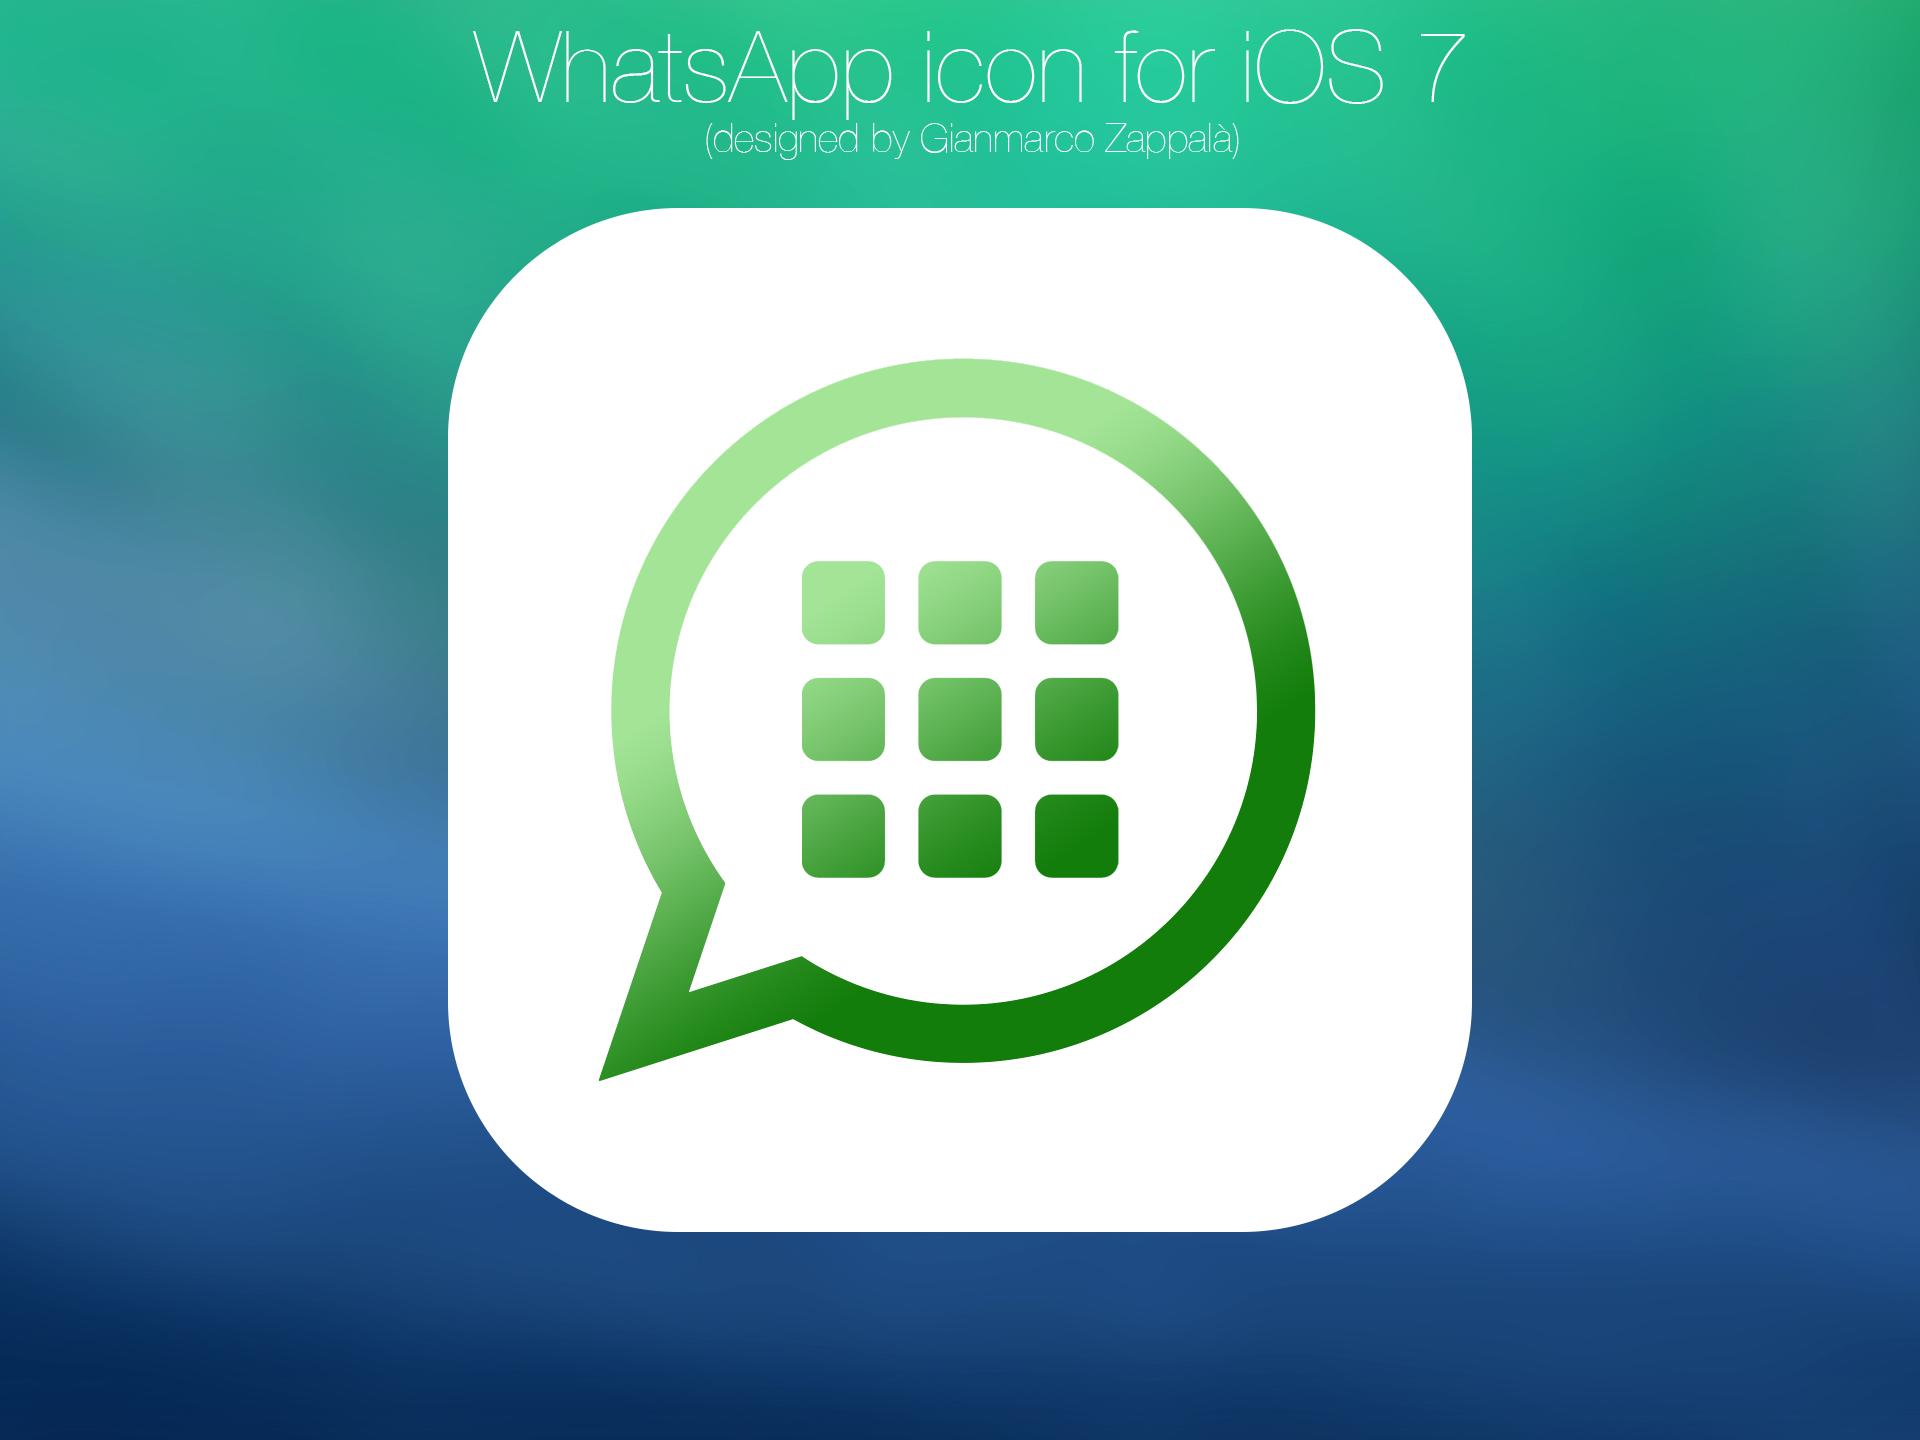 WhatsApp icon for iOS 7 by gianmarcozappala on DeviantArt